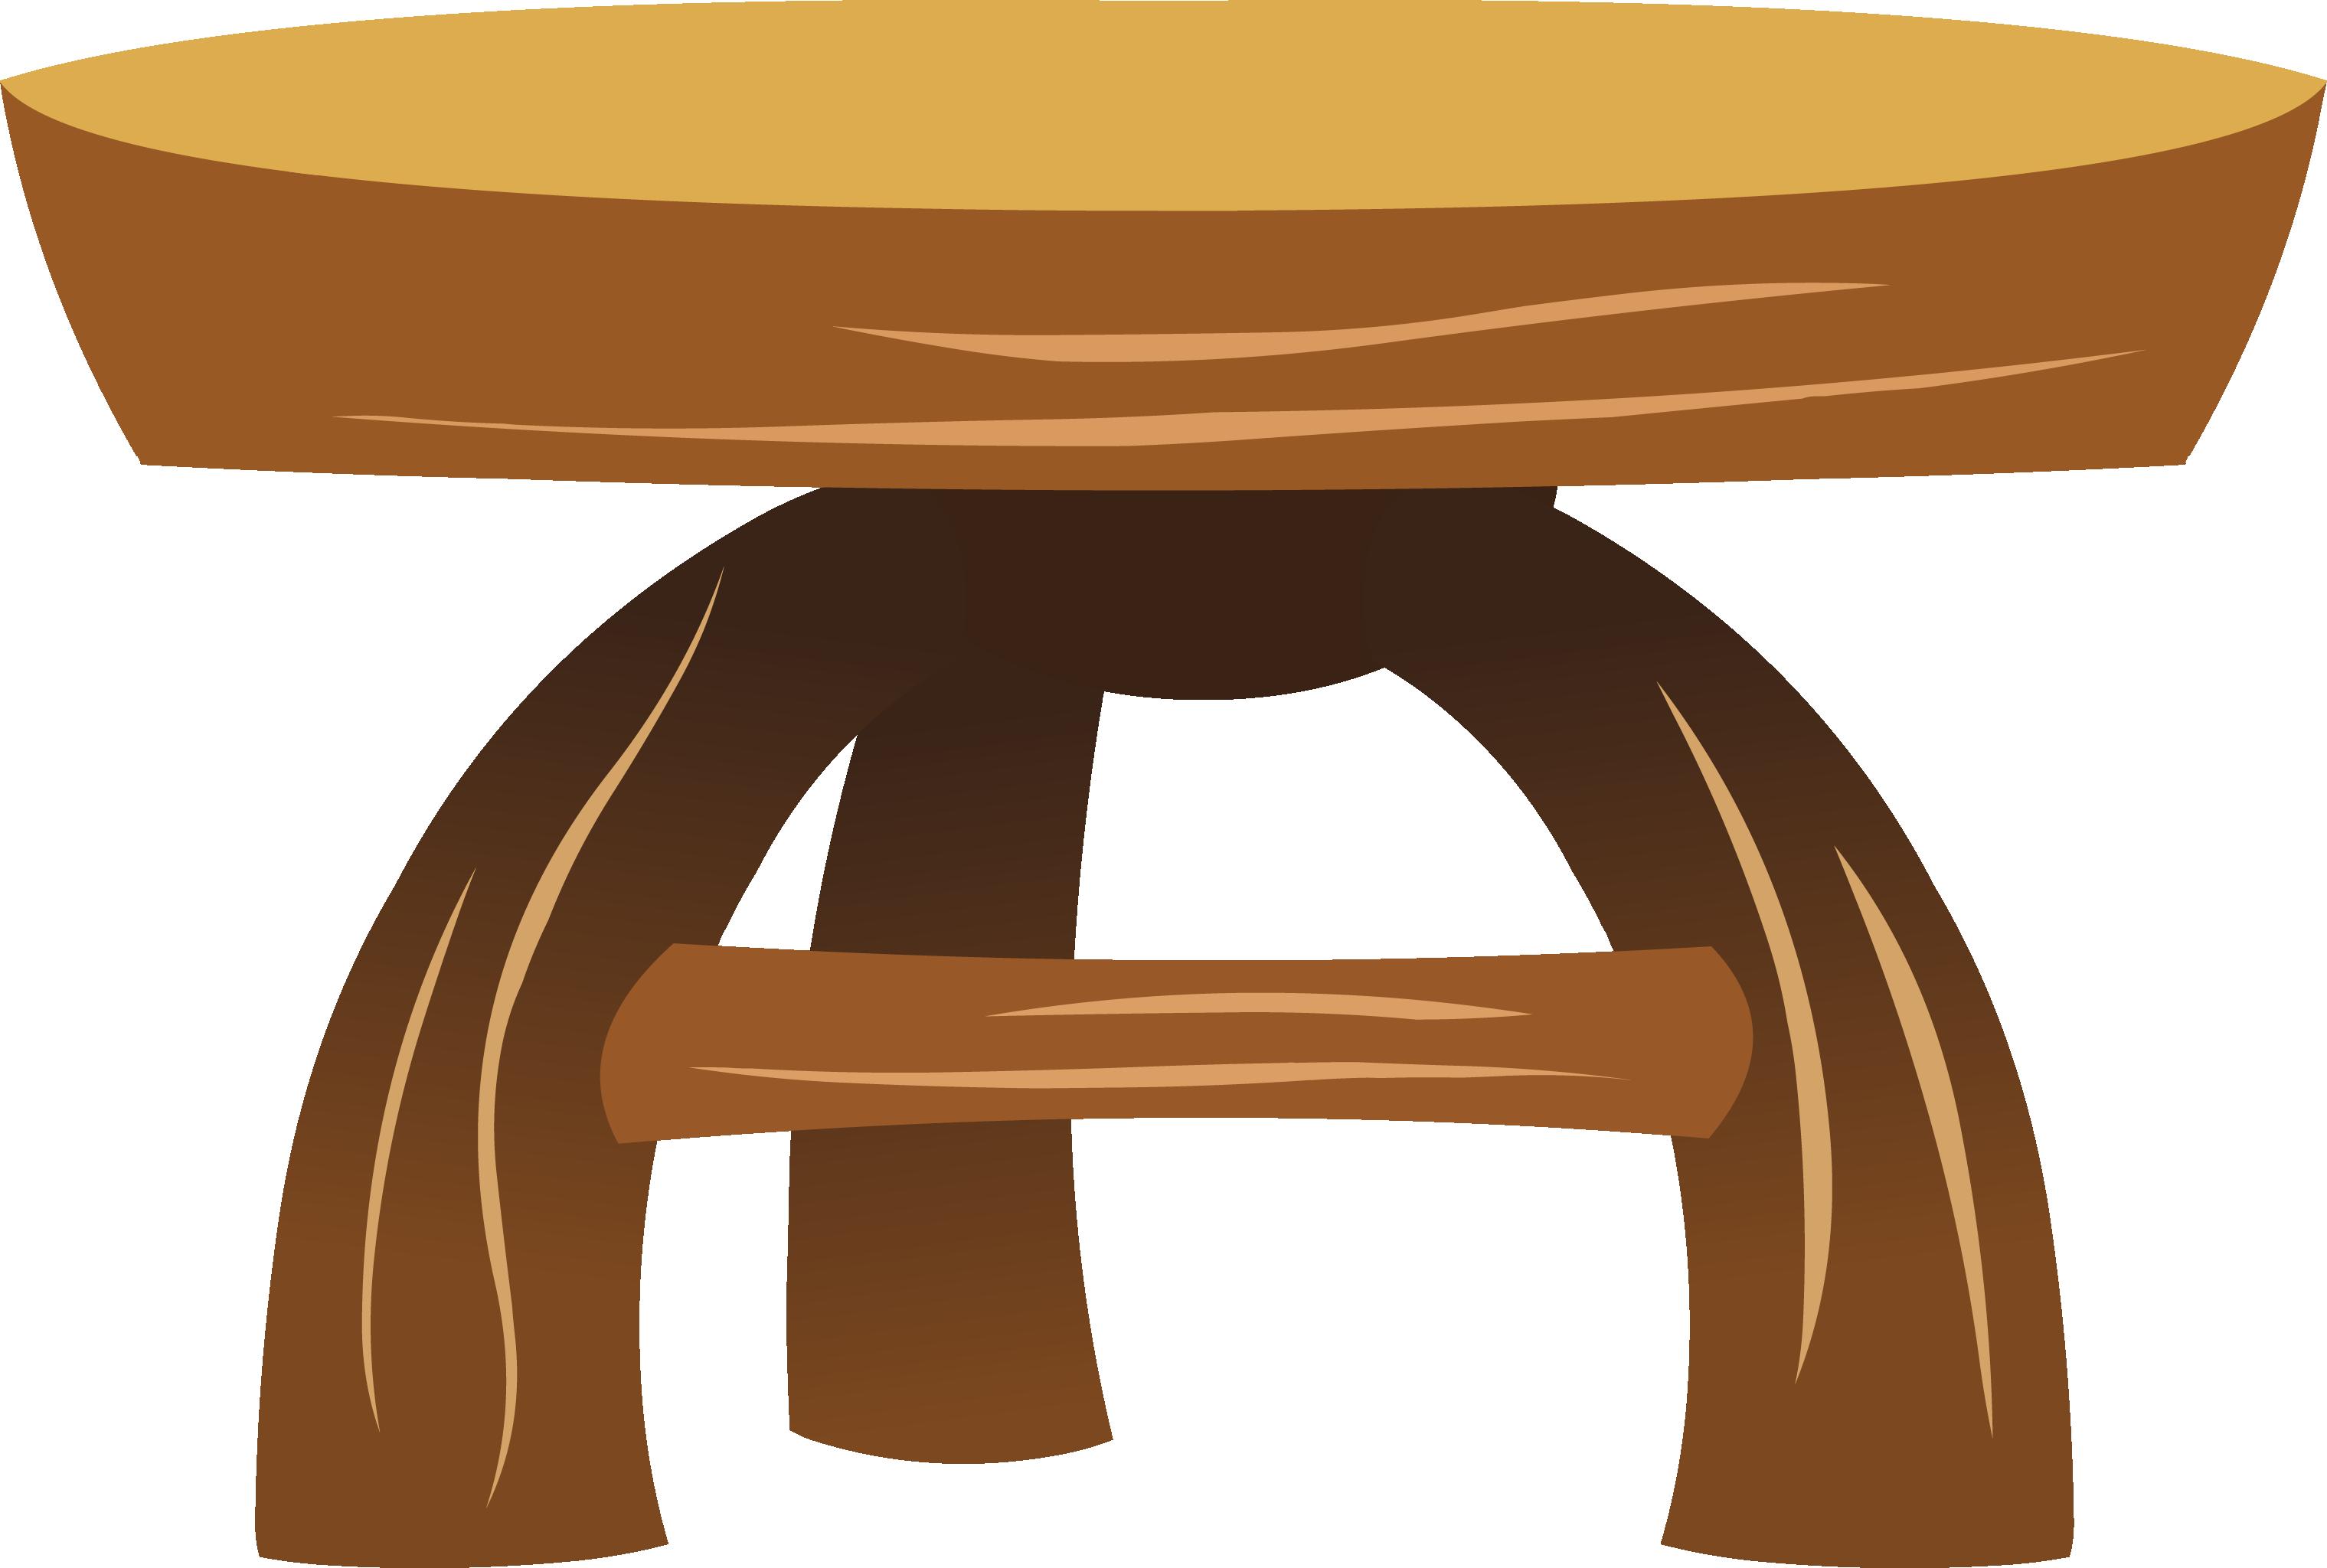 Mlp Resource Fluttershy S Table By Grievousfan On Deviantart